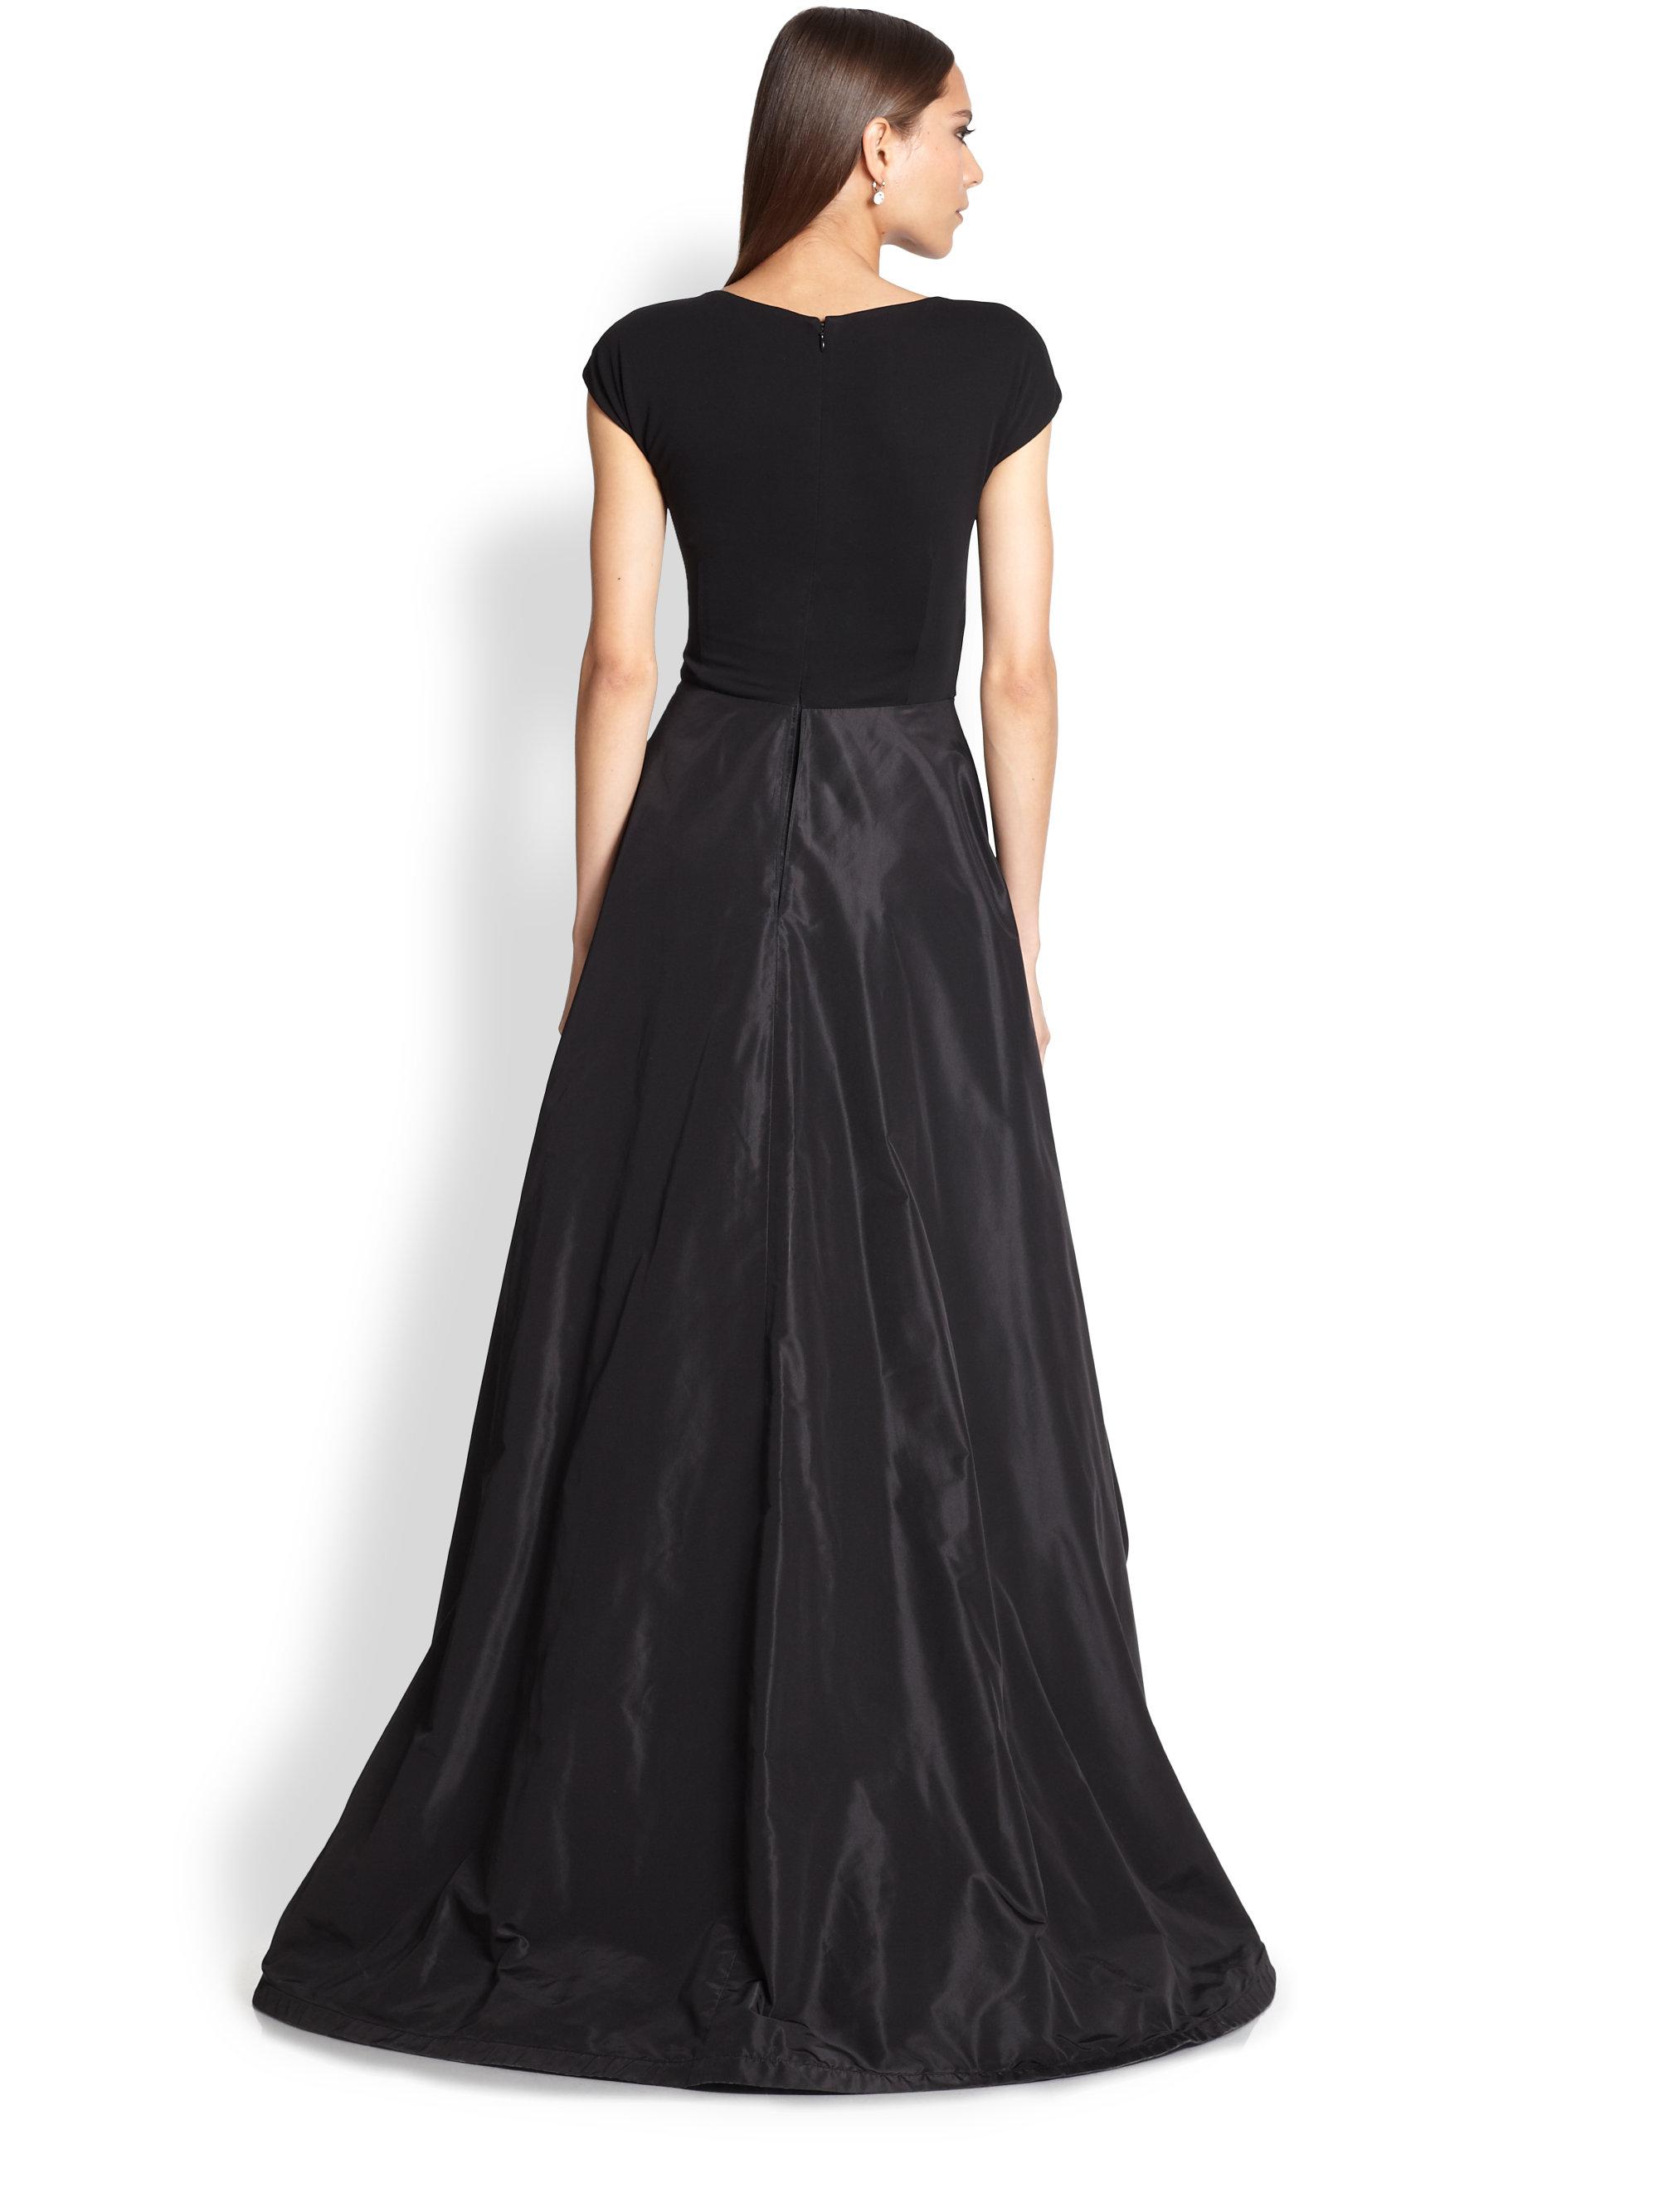 Teri Jon Evening Gowns – fashion dresses